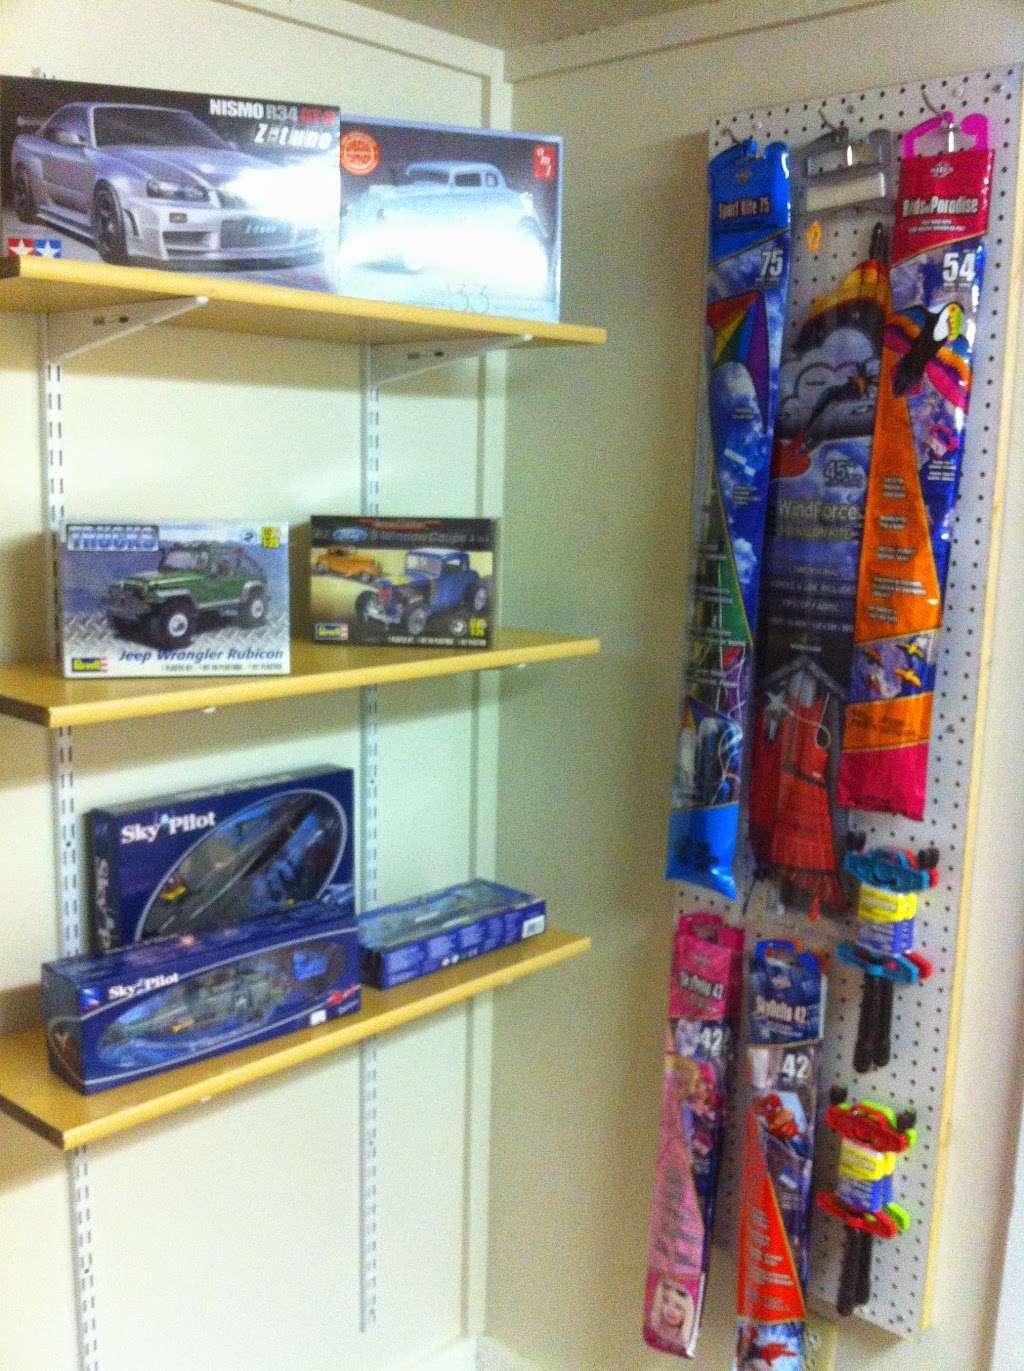 Jersey Hobby - store  | Photo 8 of 10 | Address: 76 U.S. 202 Central NJ Flemington Area U.S, Ringoes, NJ 08551, USA | Phone: (908) 968-4880